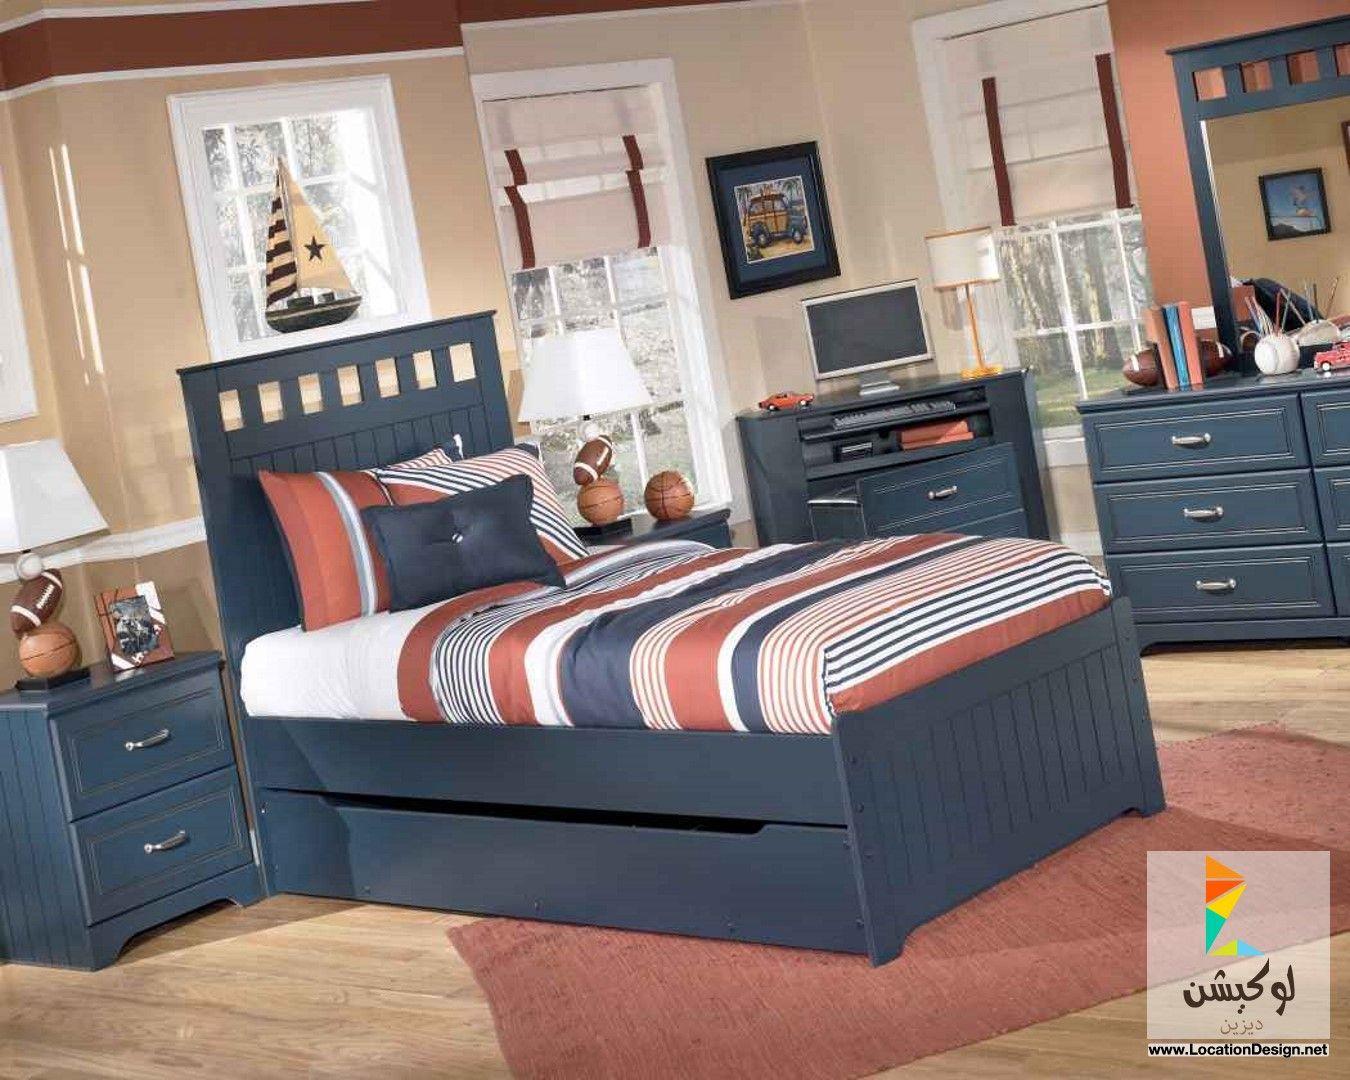 أجمل 10 تصميمات غرف نوم شباب 2015 لوكيشن ديزاين تصميمات ديكورات أفكار جديدة مصر Locationdesign Com Home Decor Interior Design Furniture